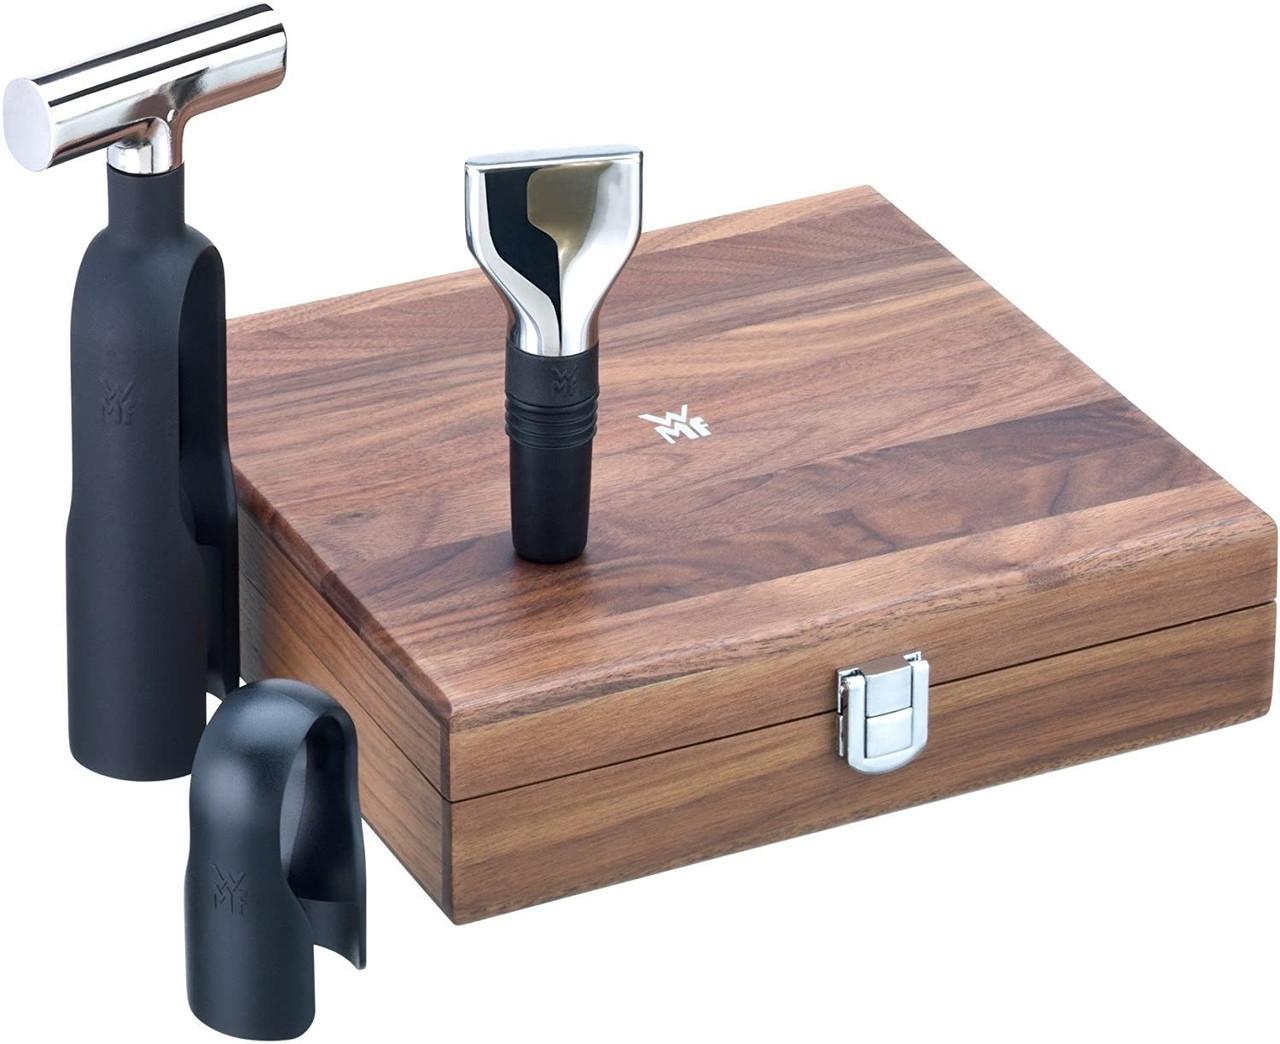 Набор для вина WMF Baric Sommelier, 3 предмета, штопор, резак, пробка, в коробке из орехового дерева